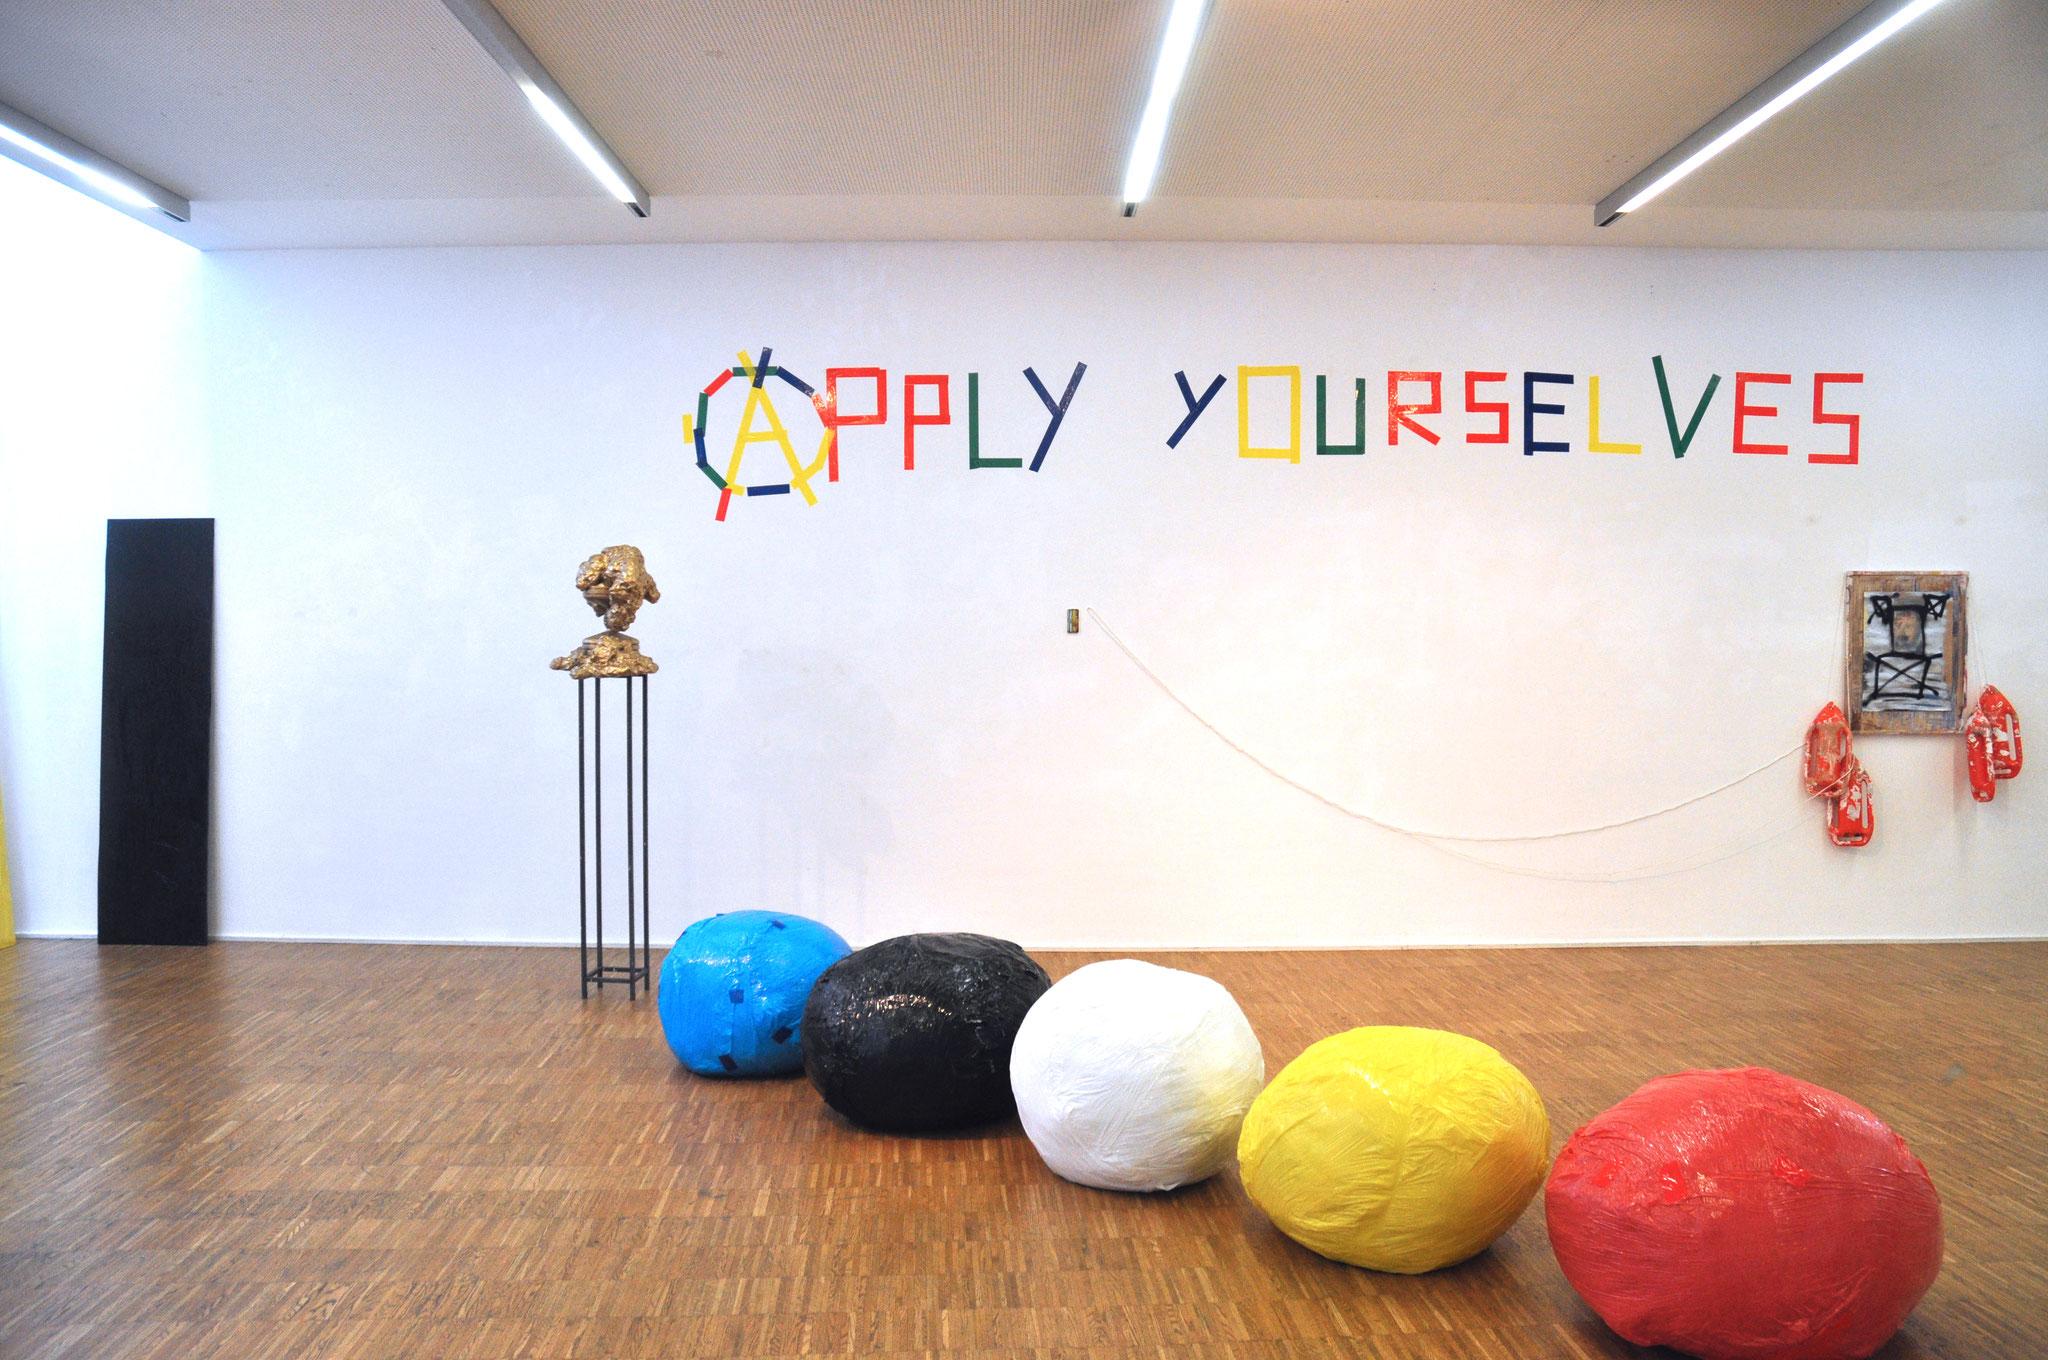 Futur Extrakt, MAERZ Artist Association, Linz (AT), 2018